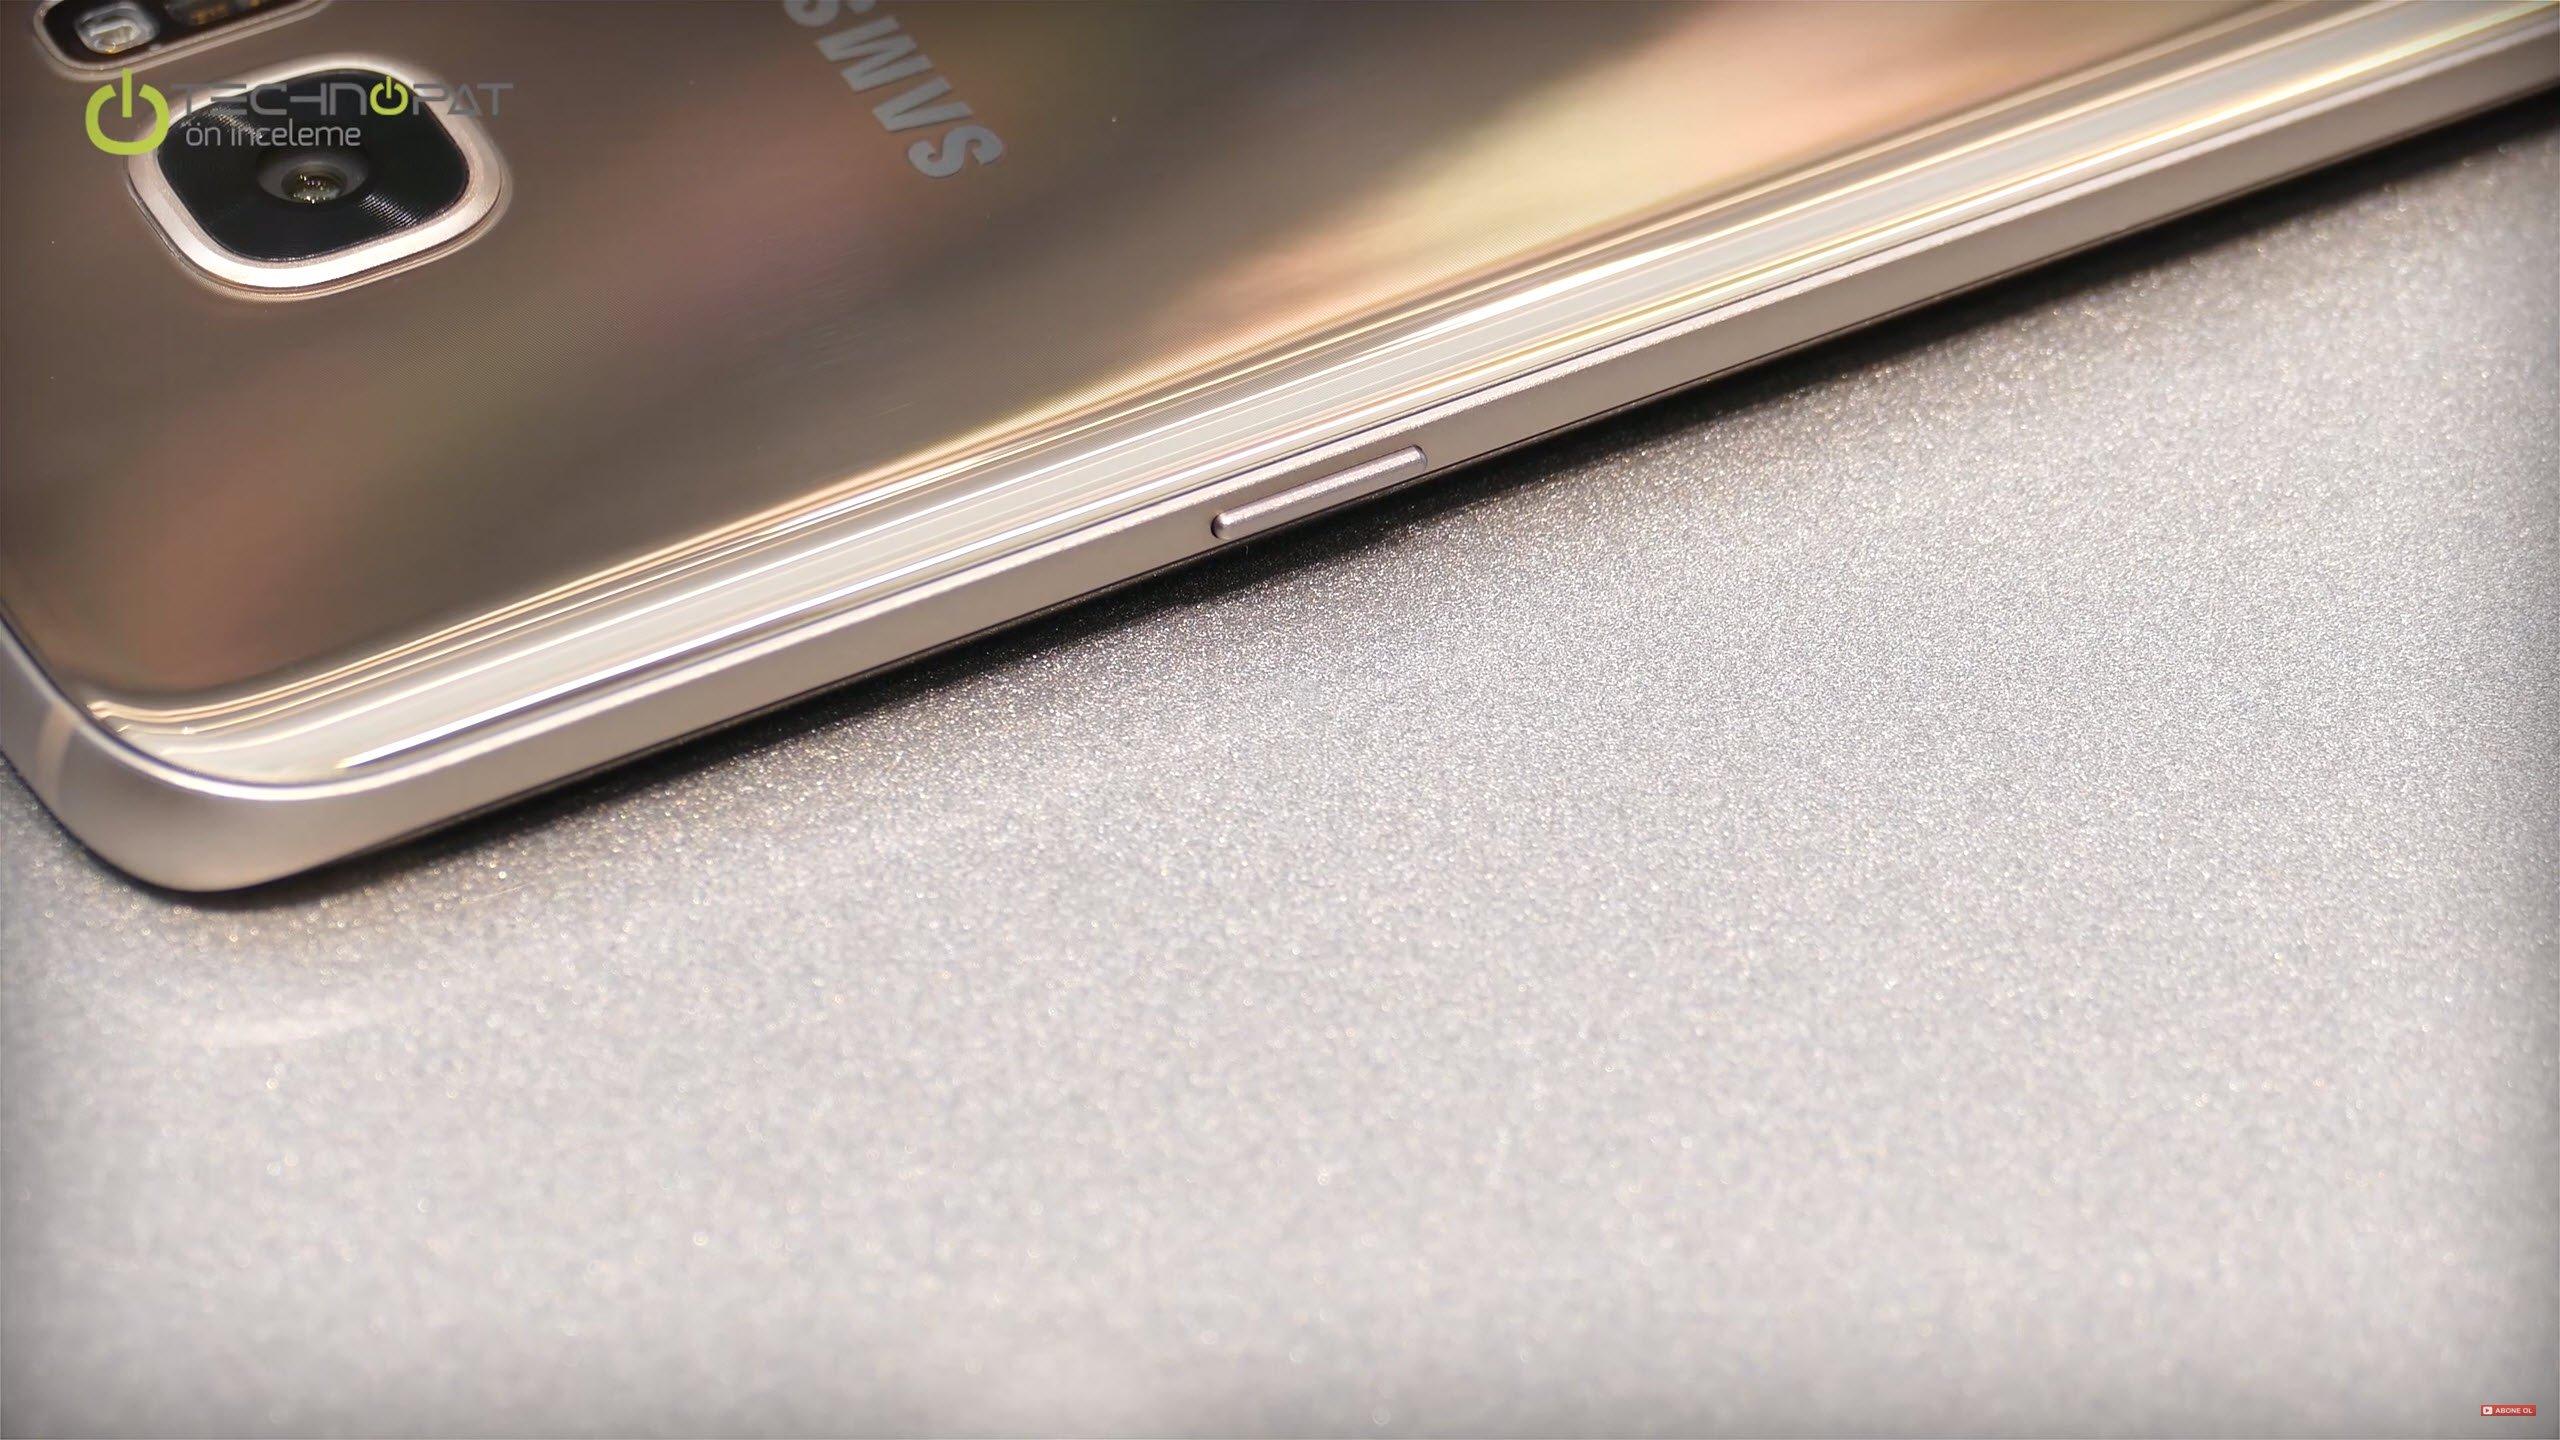 Samsung Galaxy S7 Edge Ön İnceleme - MWC 2016